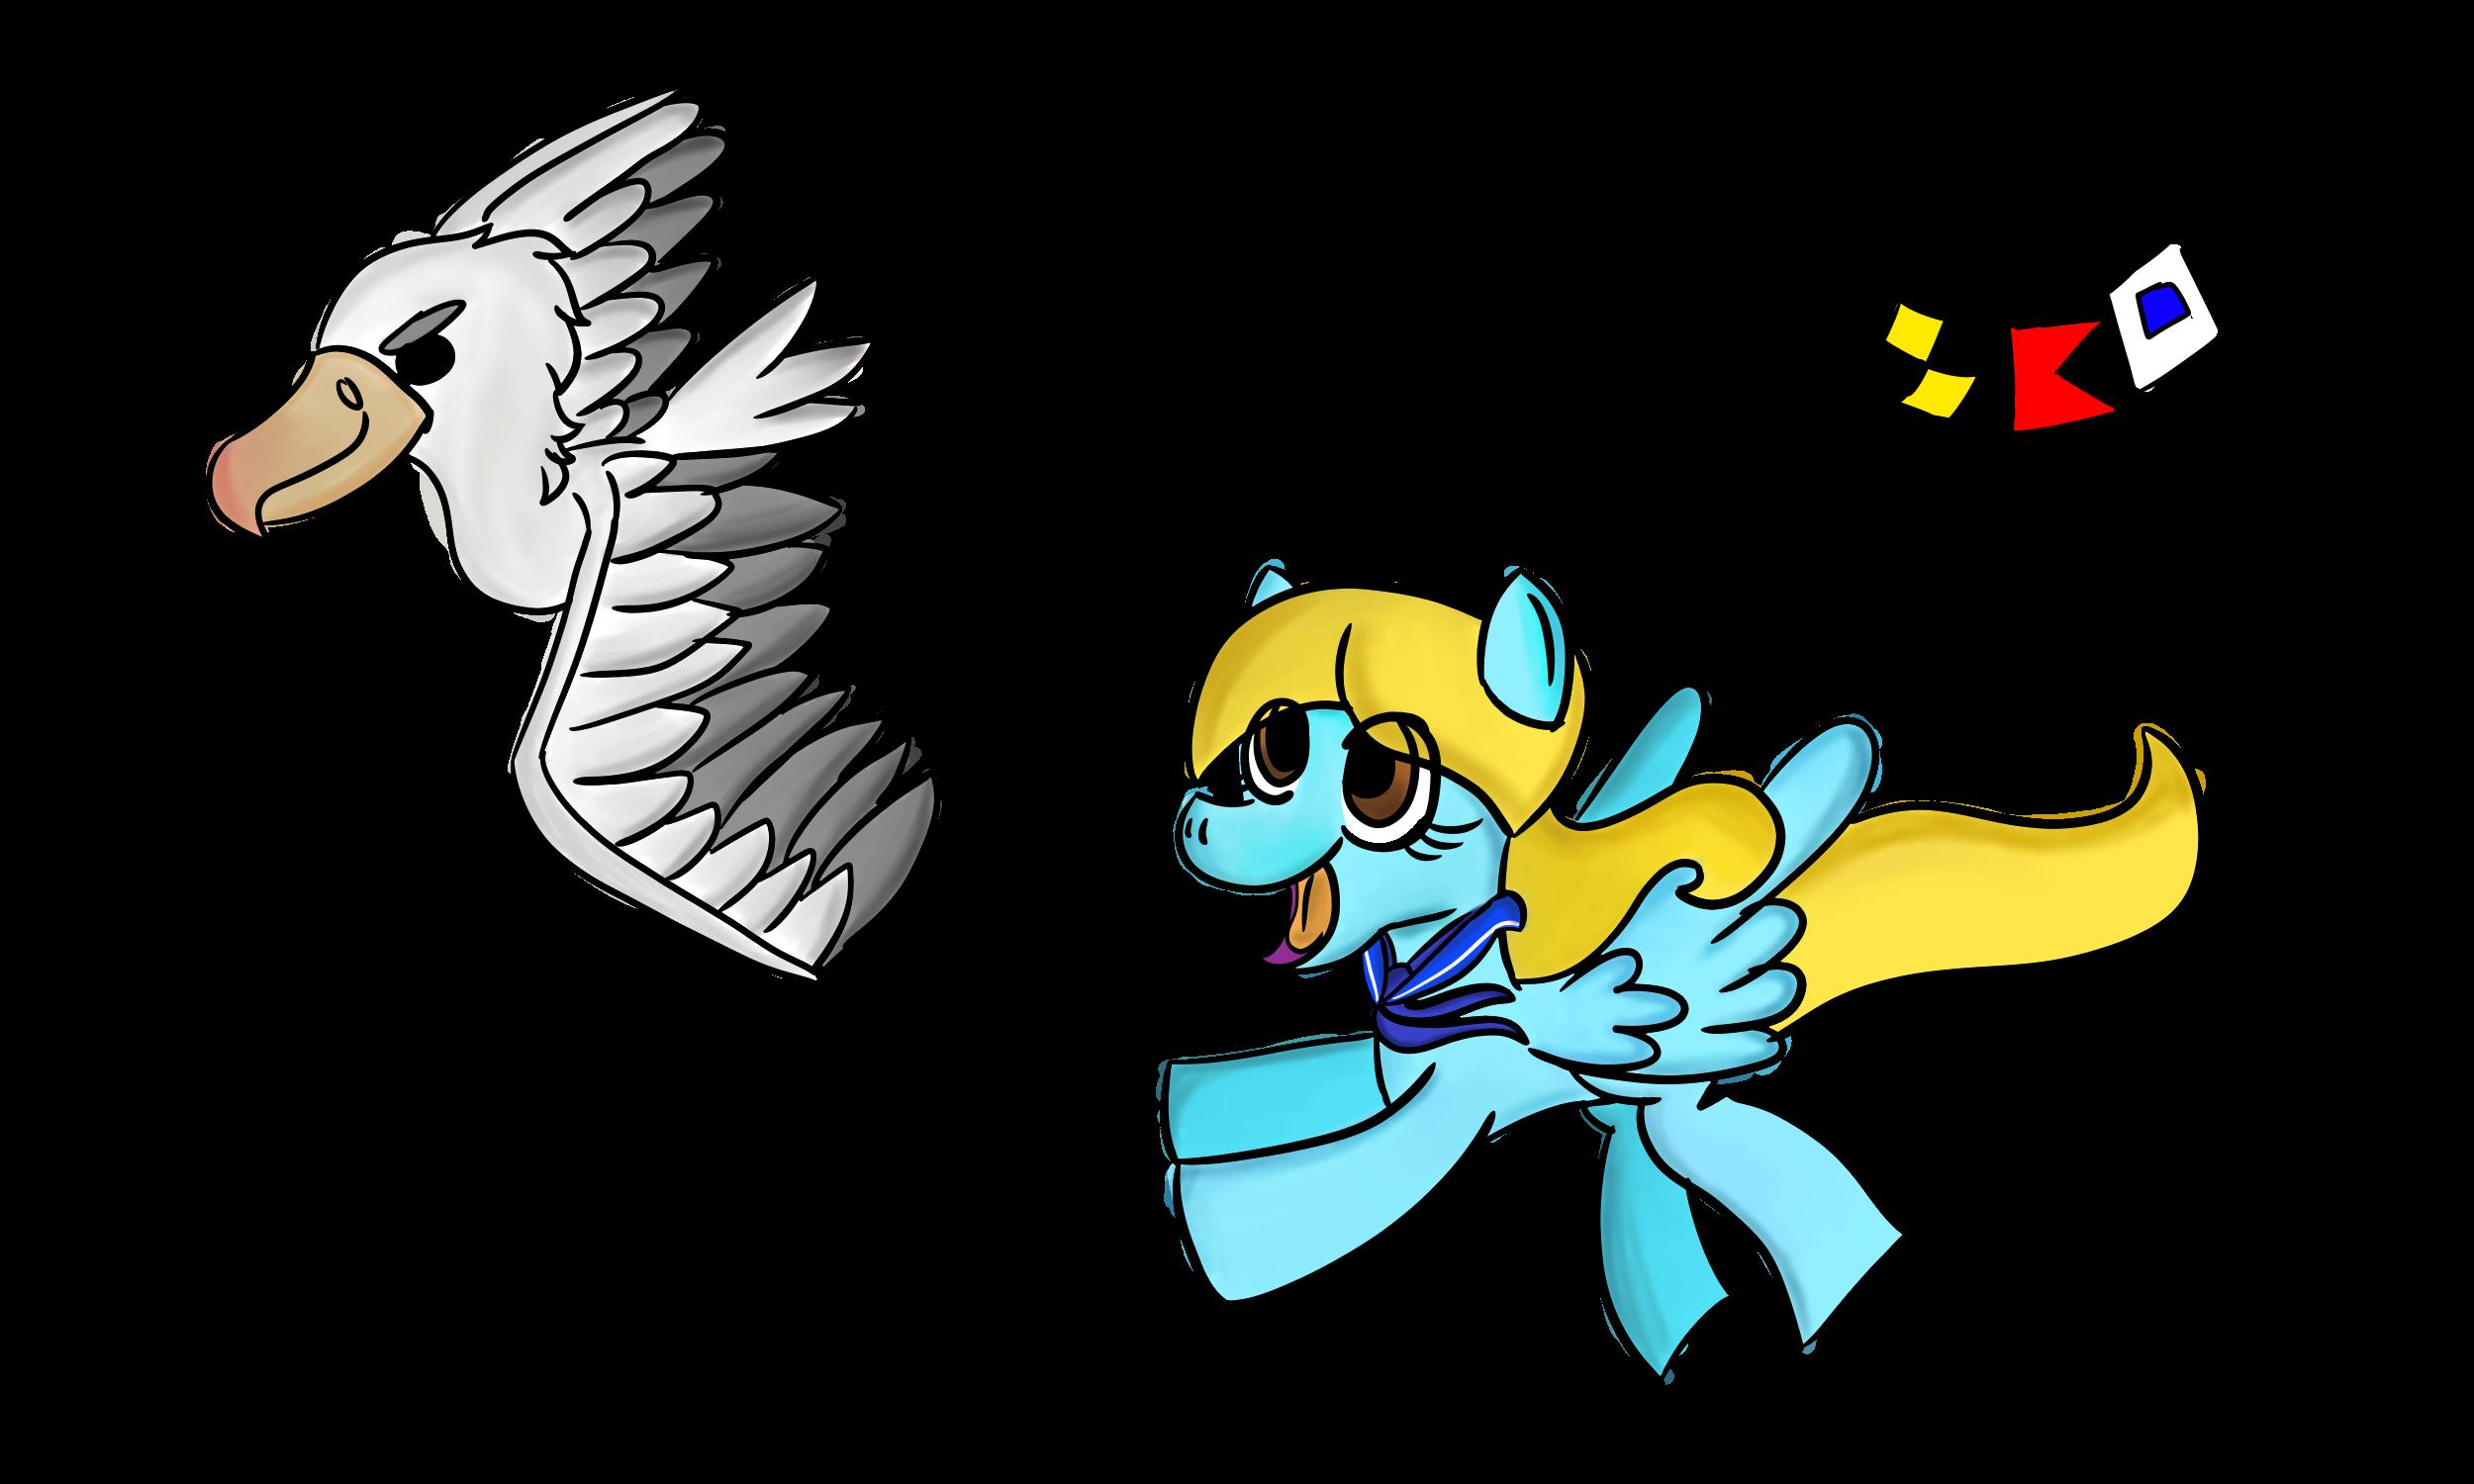 ponysona__little_blue_sailor_by_chibidas